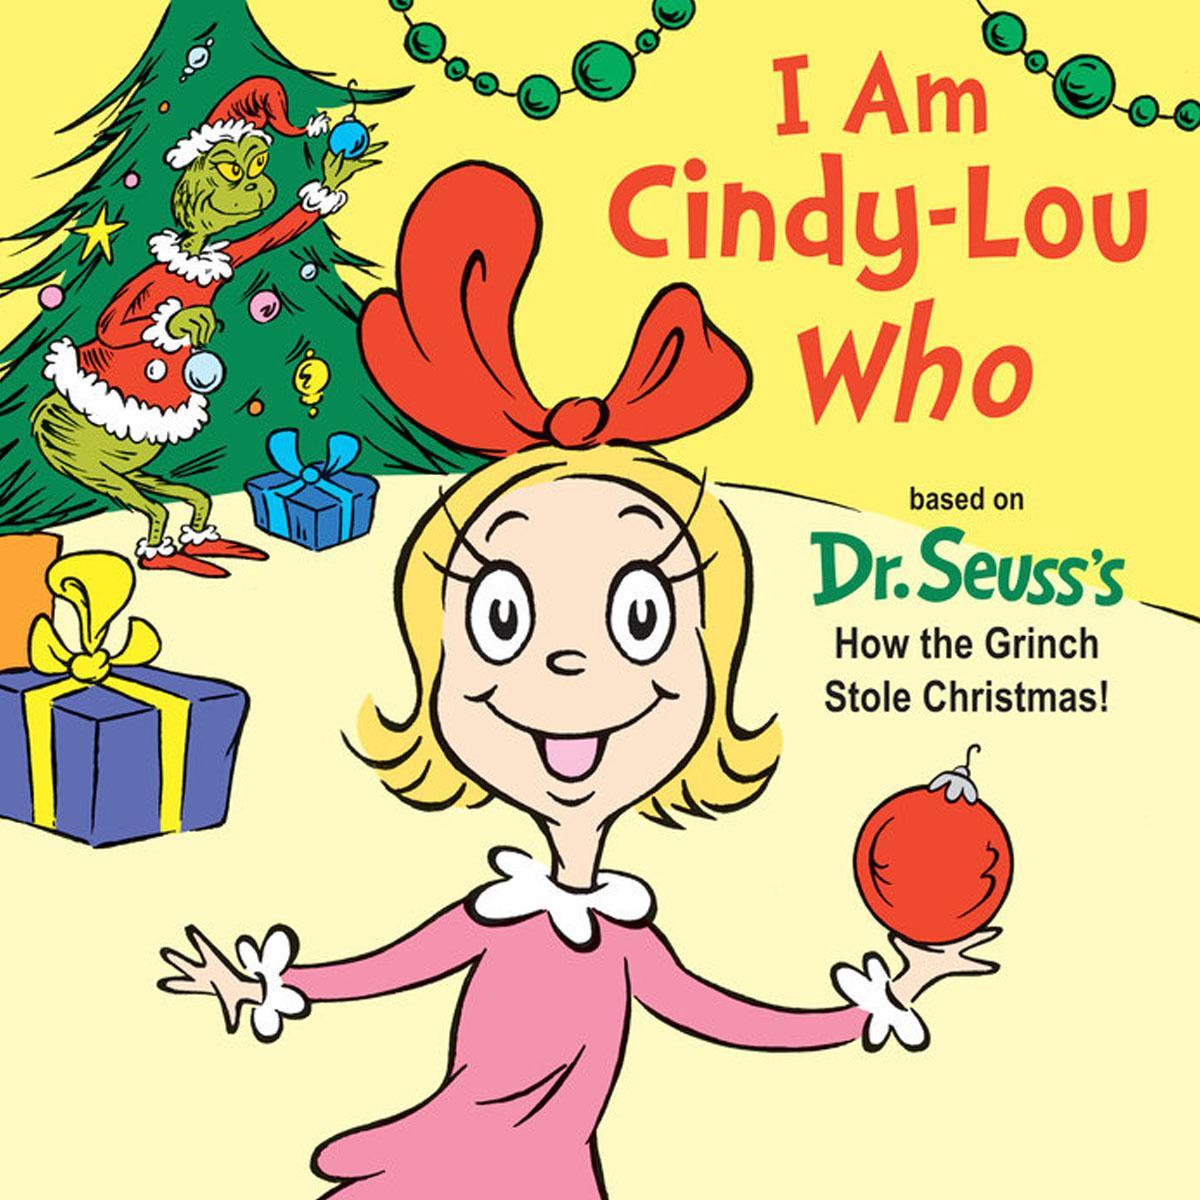 I Am Cindy.